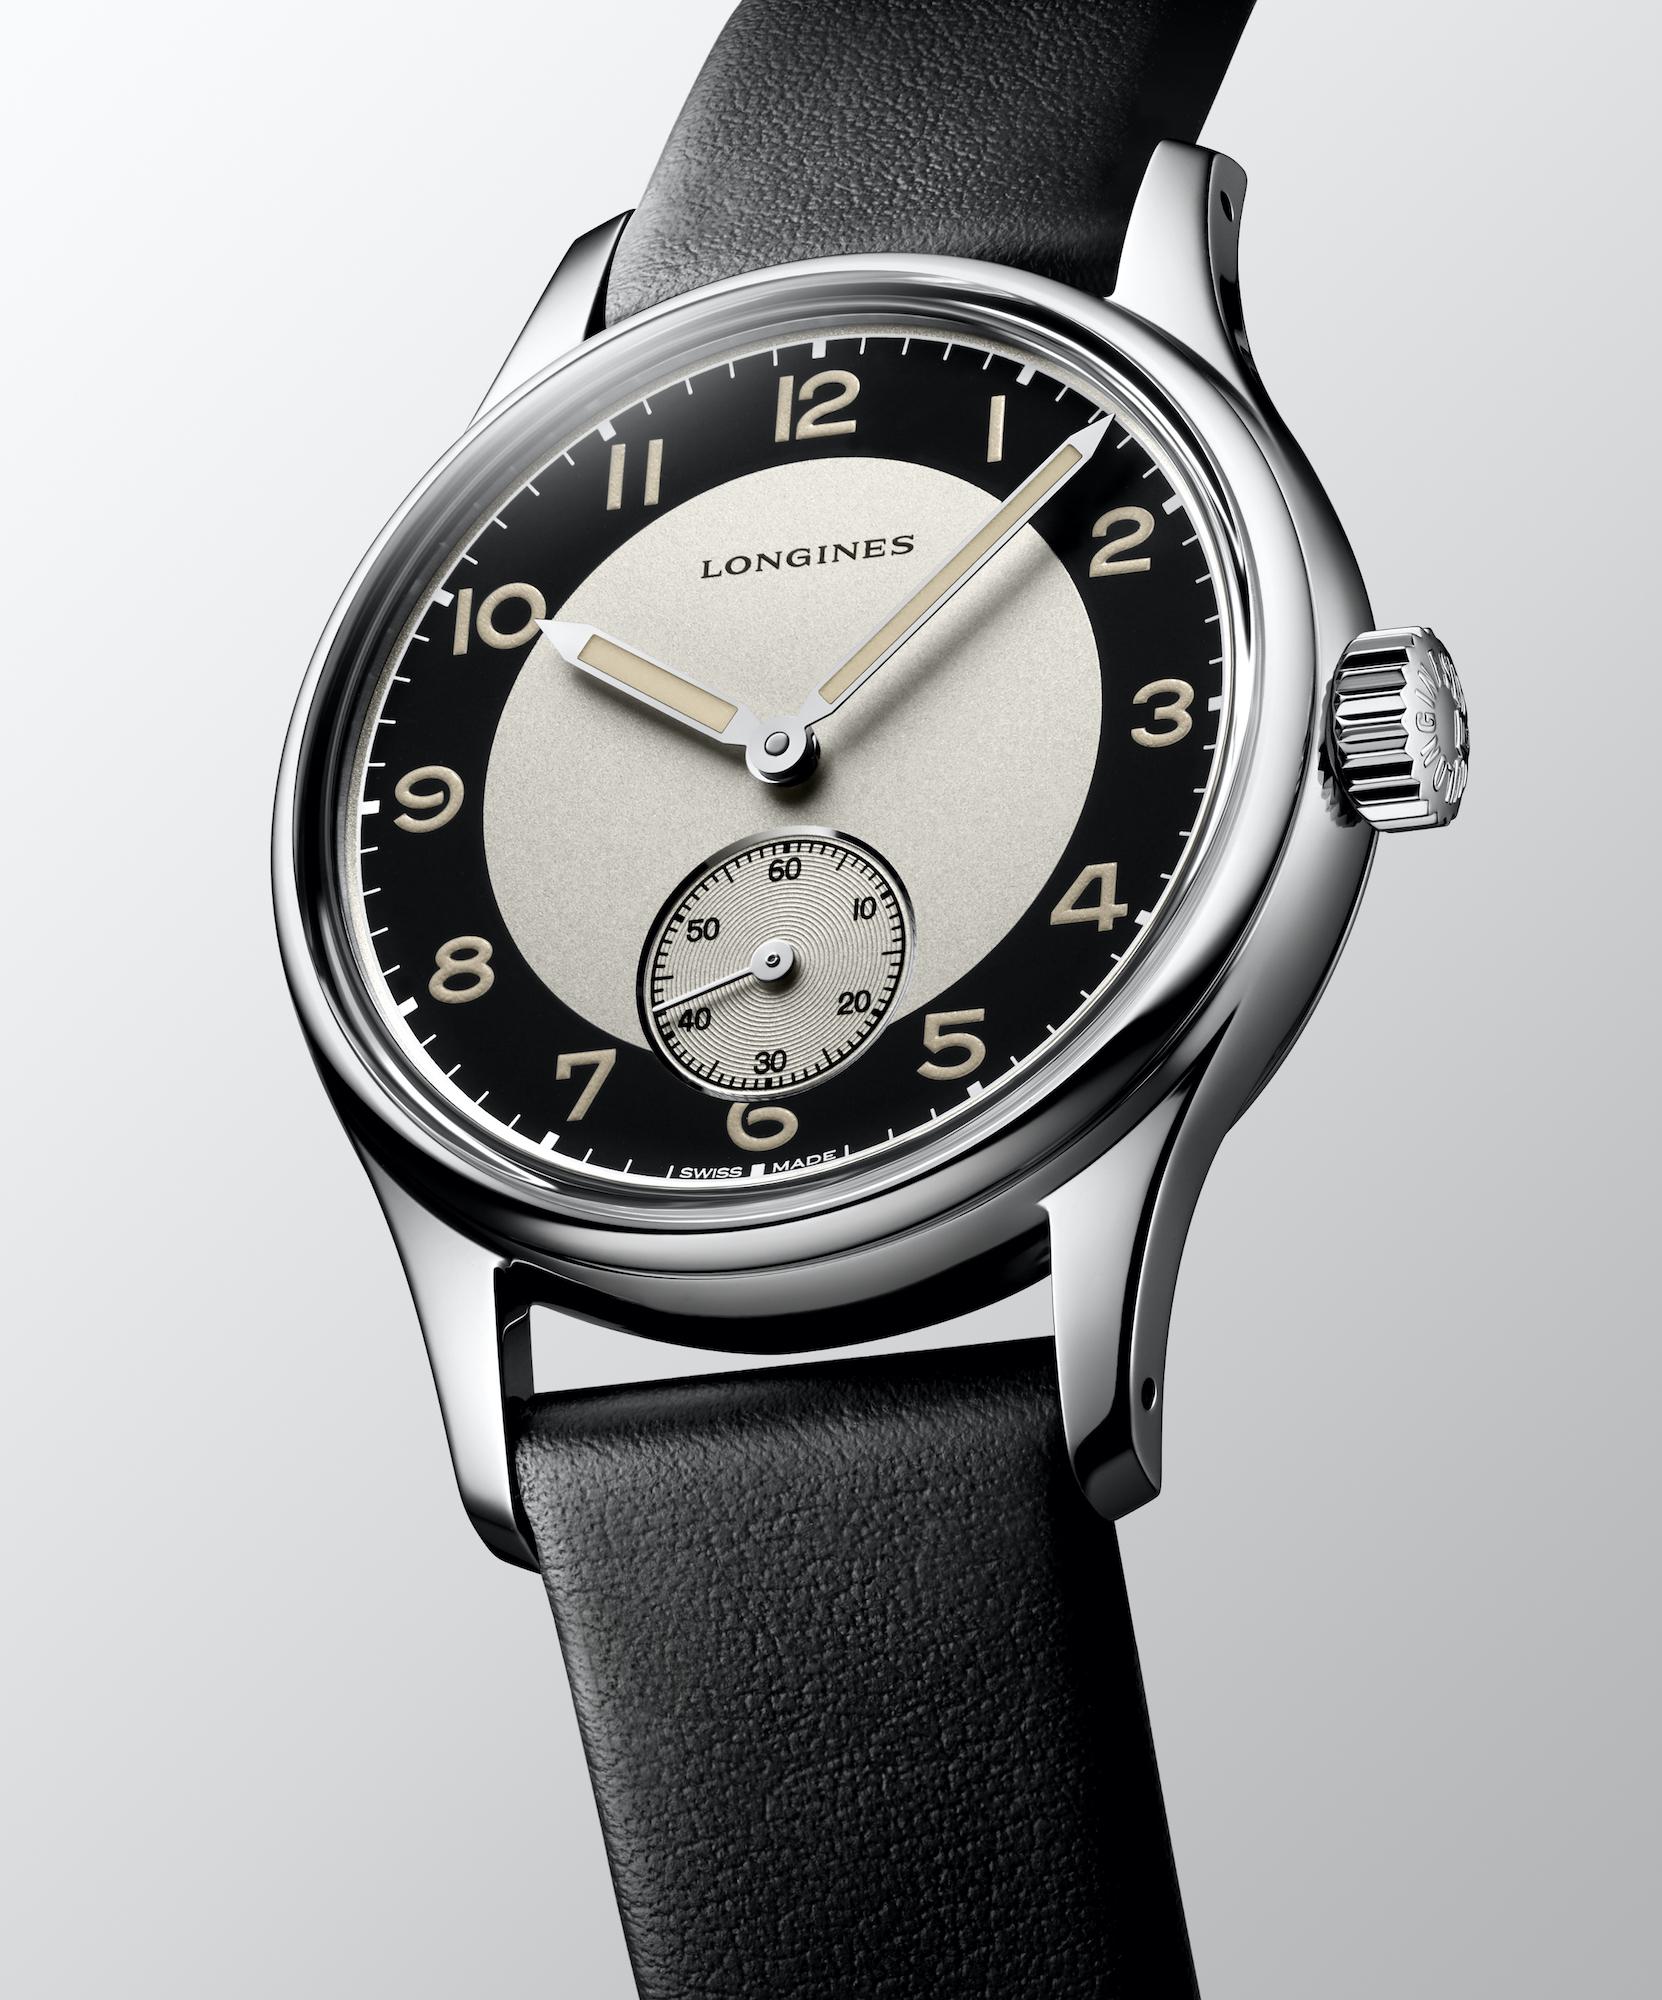 The Longines Heritage Classic - Tuxedo L2.330.4.93.0